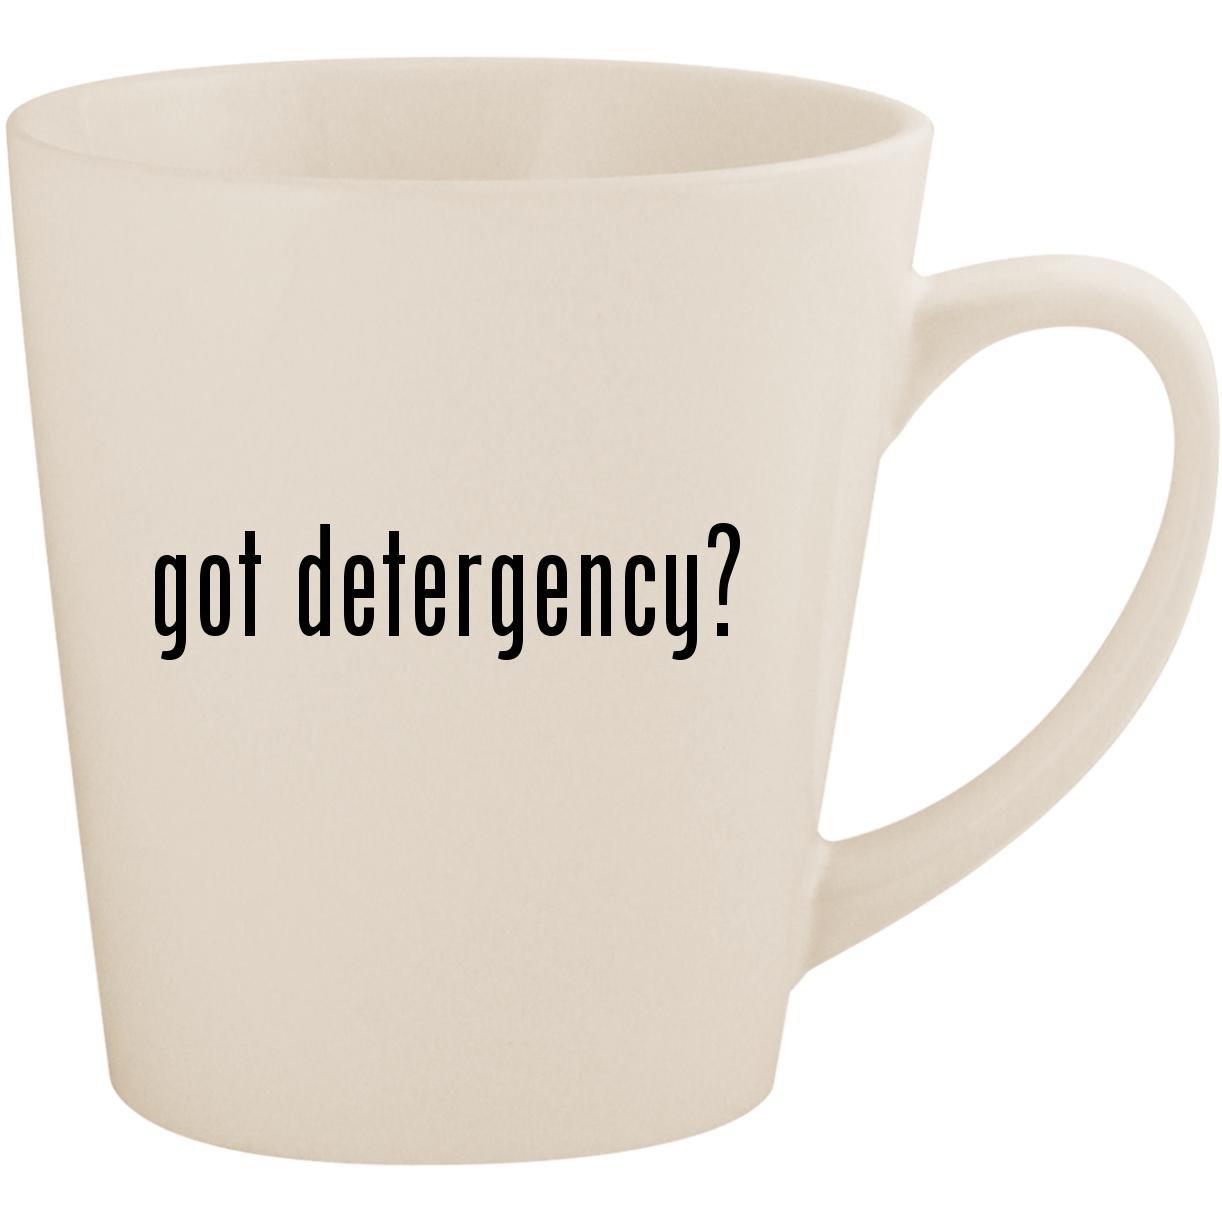 got detergency? - White 12oz Ceramic Latte Mug Cup